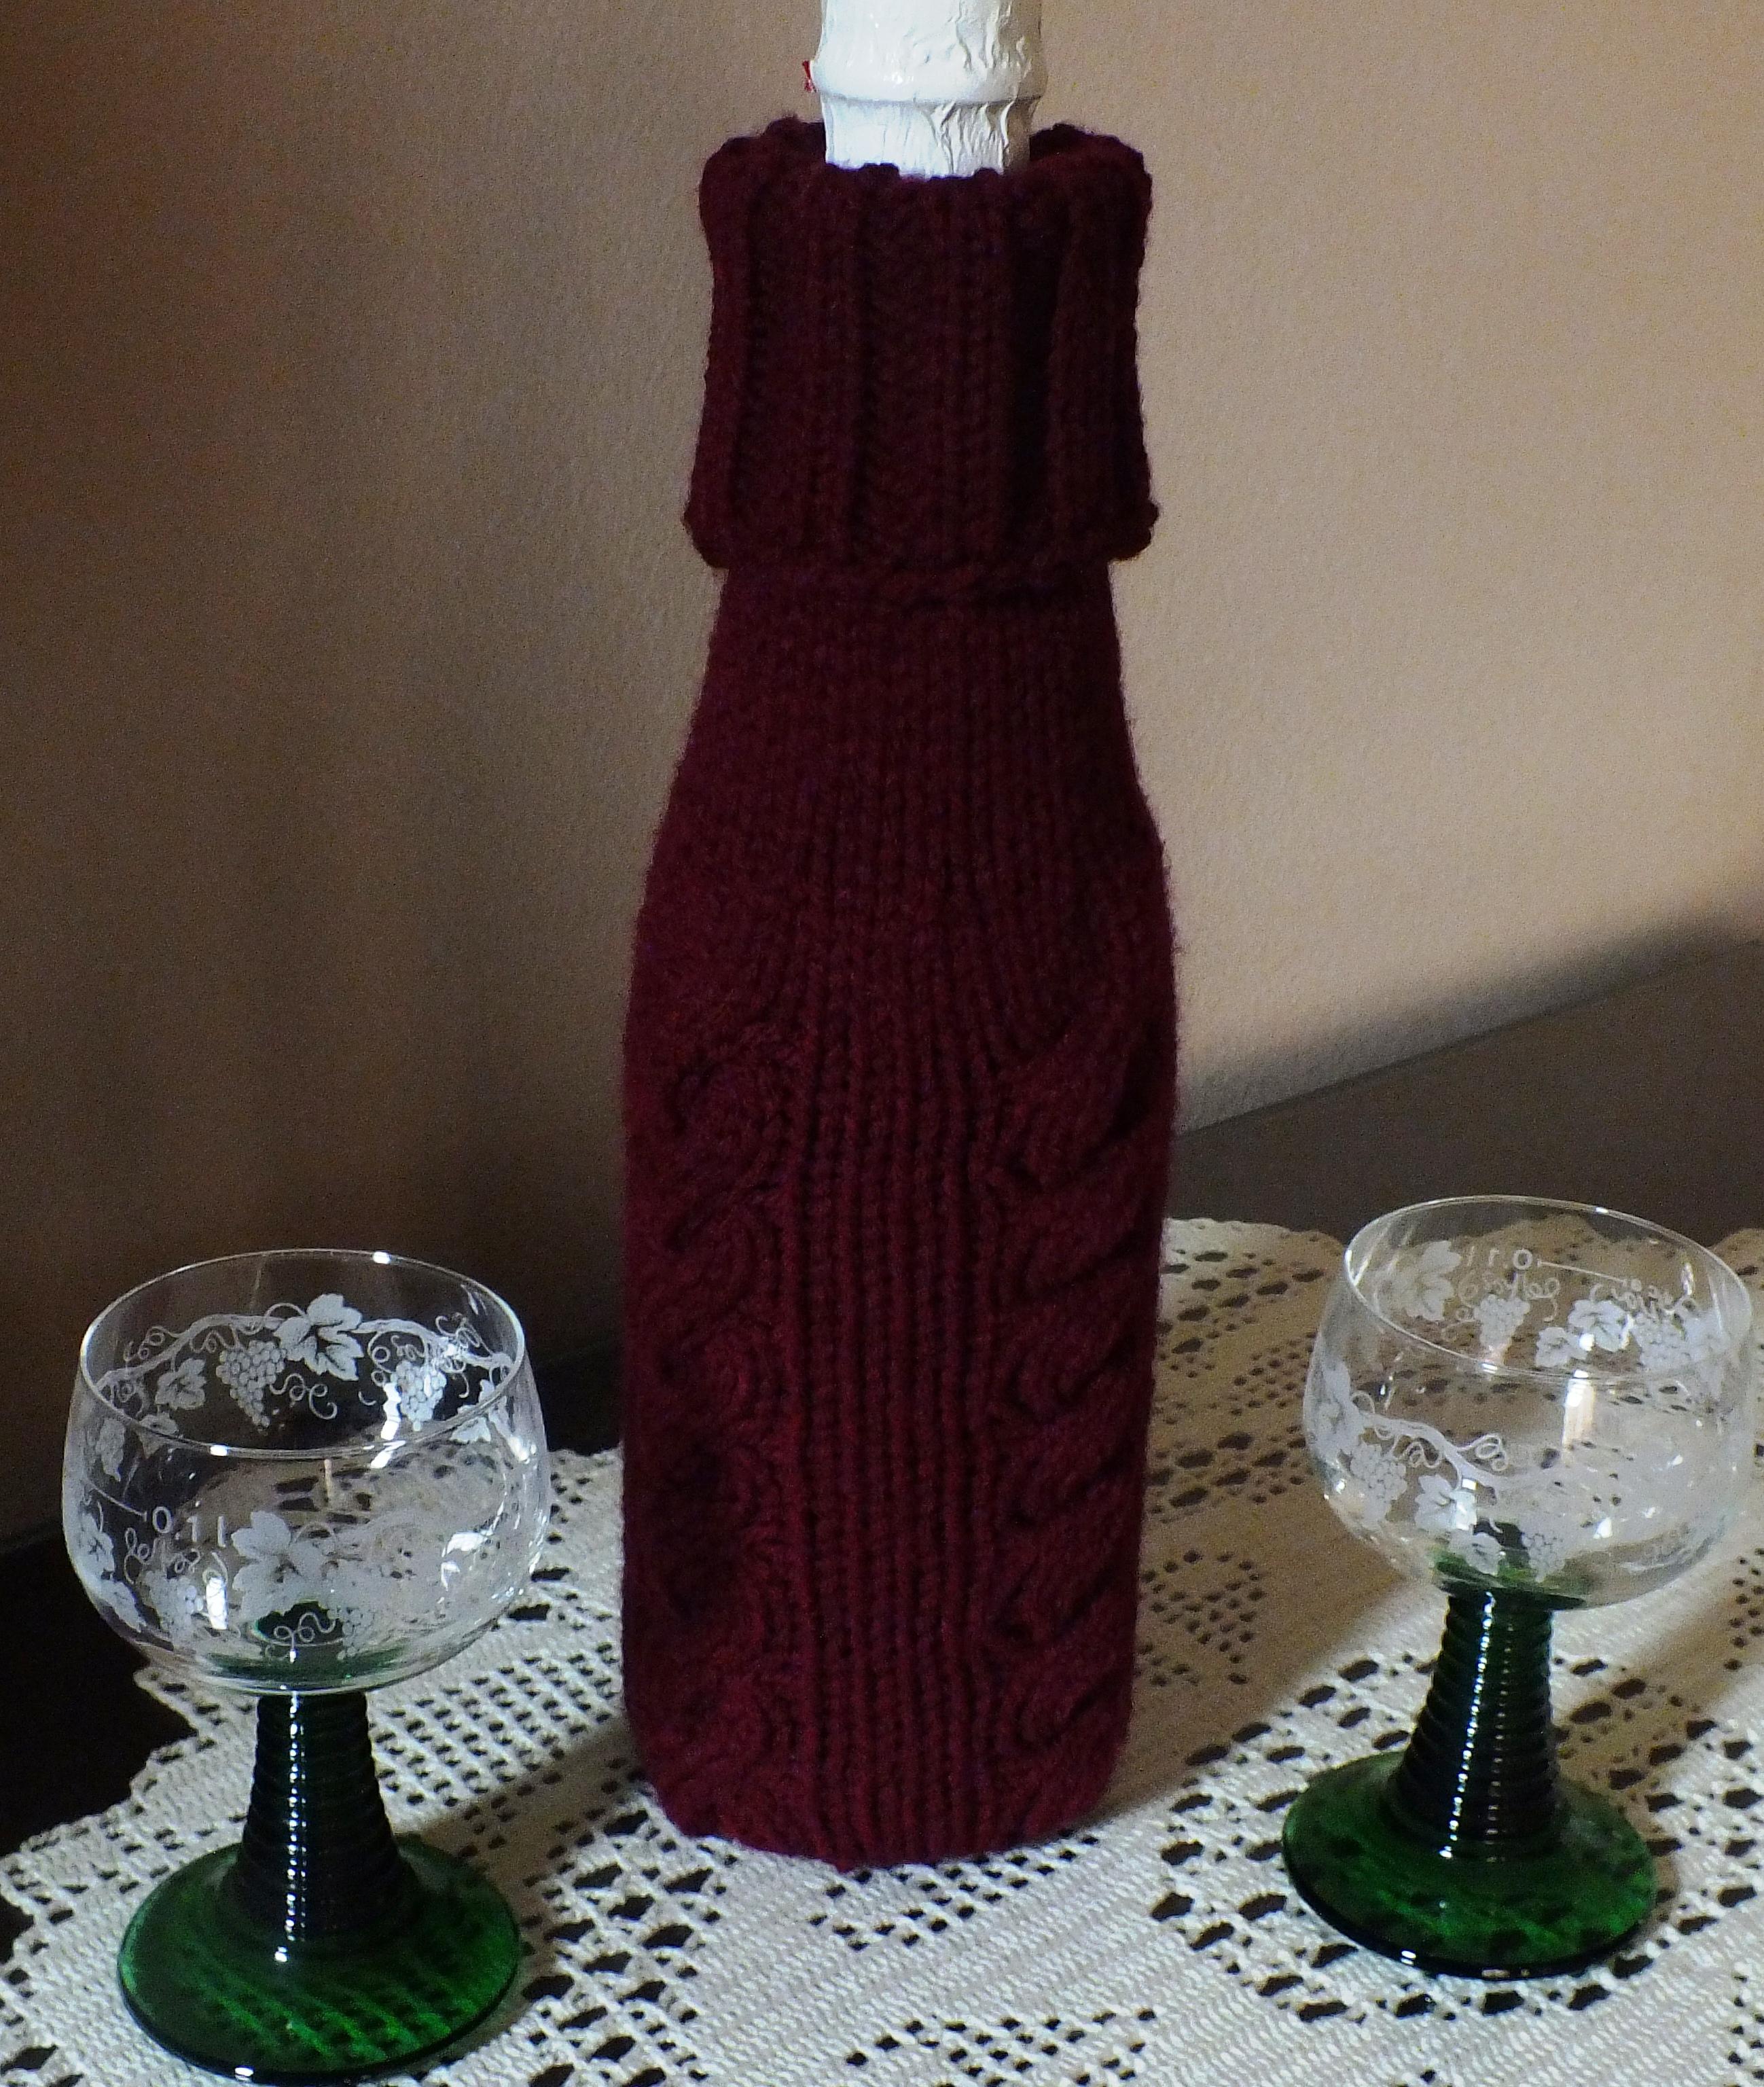 Machine Knitted Wine Bottle Cover | Cckittenknits\'s Weblog